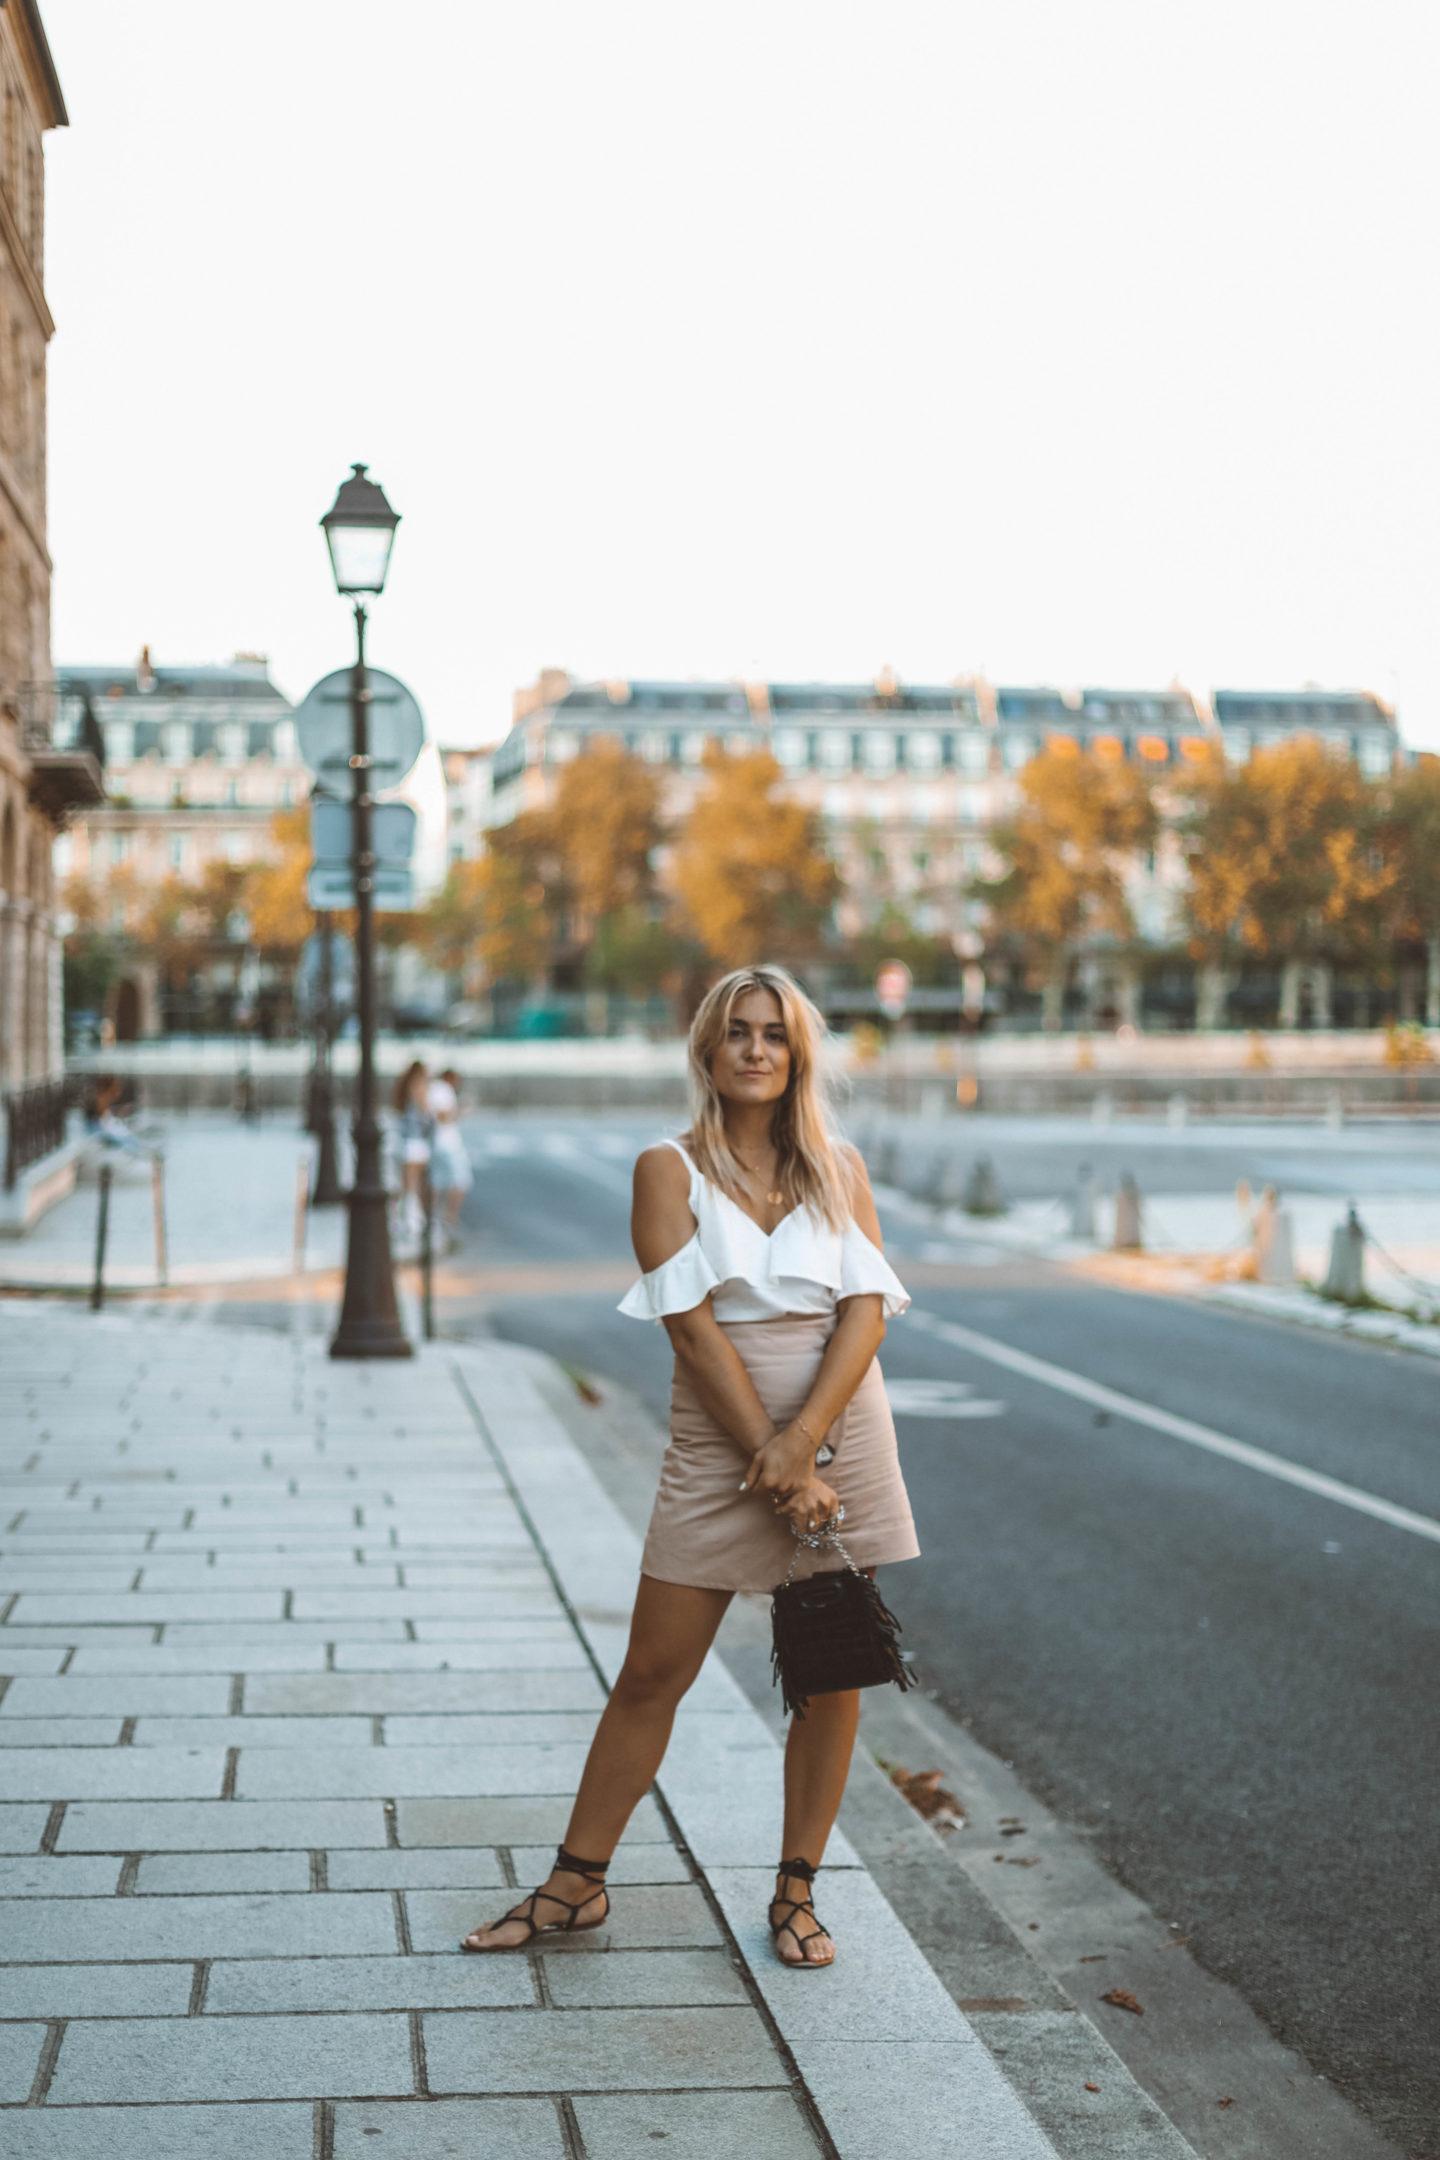 Visiter Paris - Blondie baby blog mode Paris et voyages